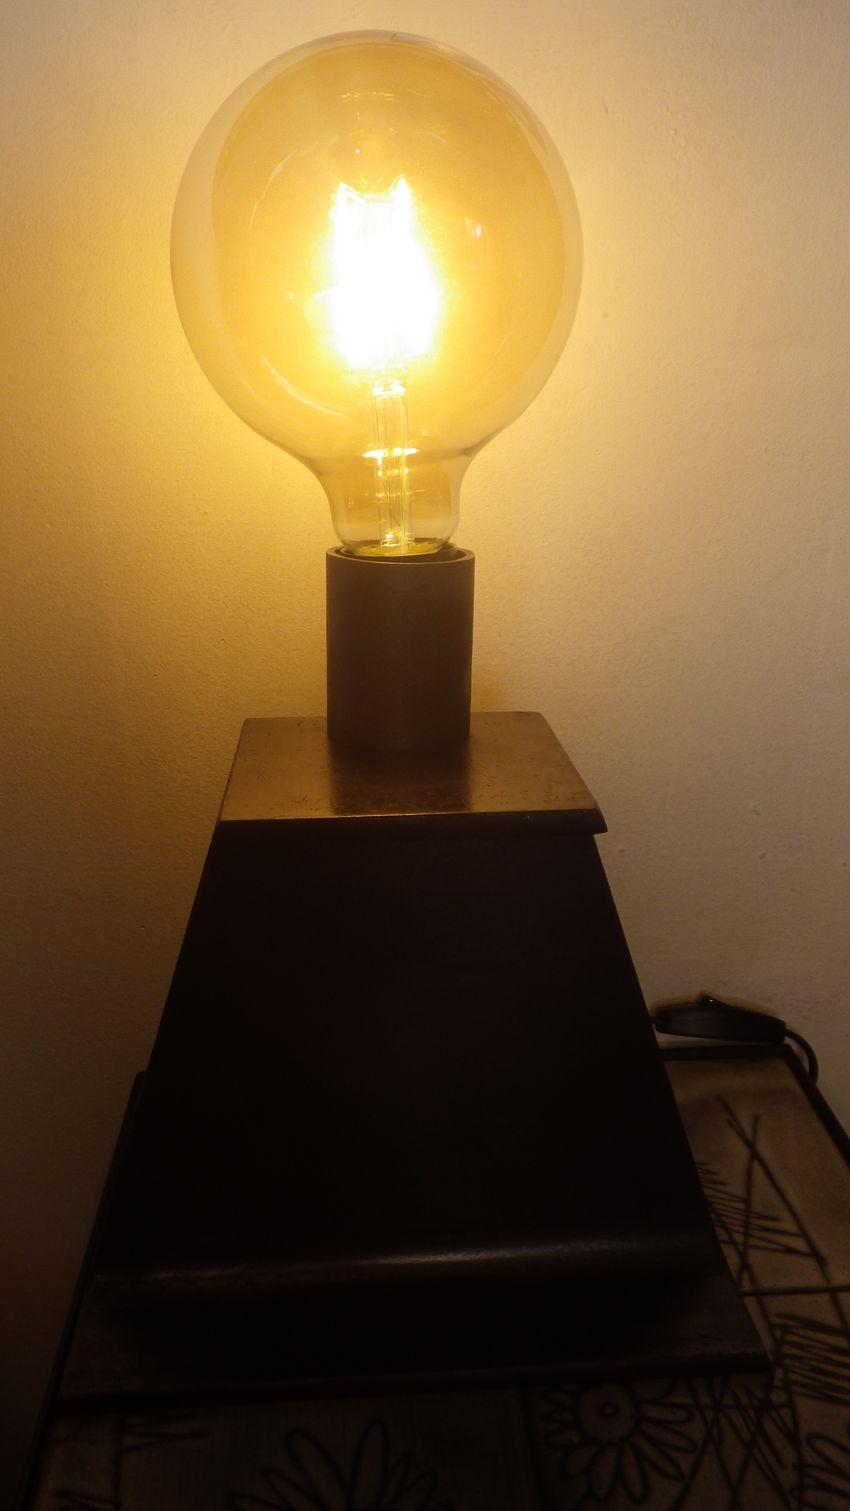 Lampe poser en acier ipn luminaire de style industriel loft - Lampe industrielle a poser ...